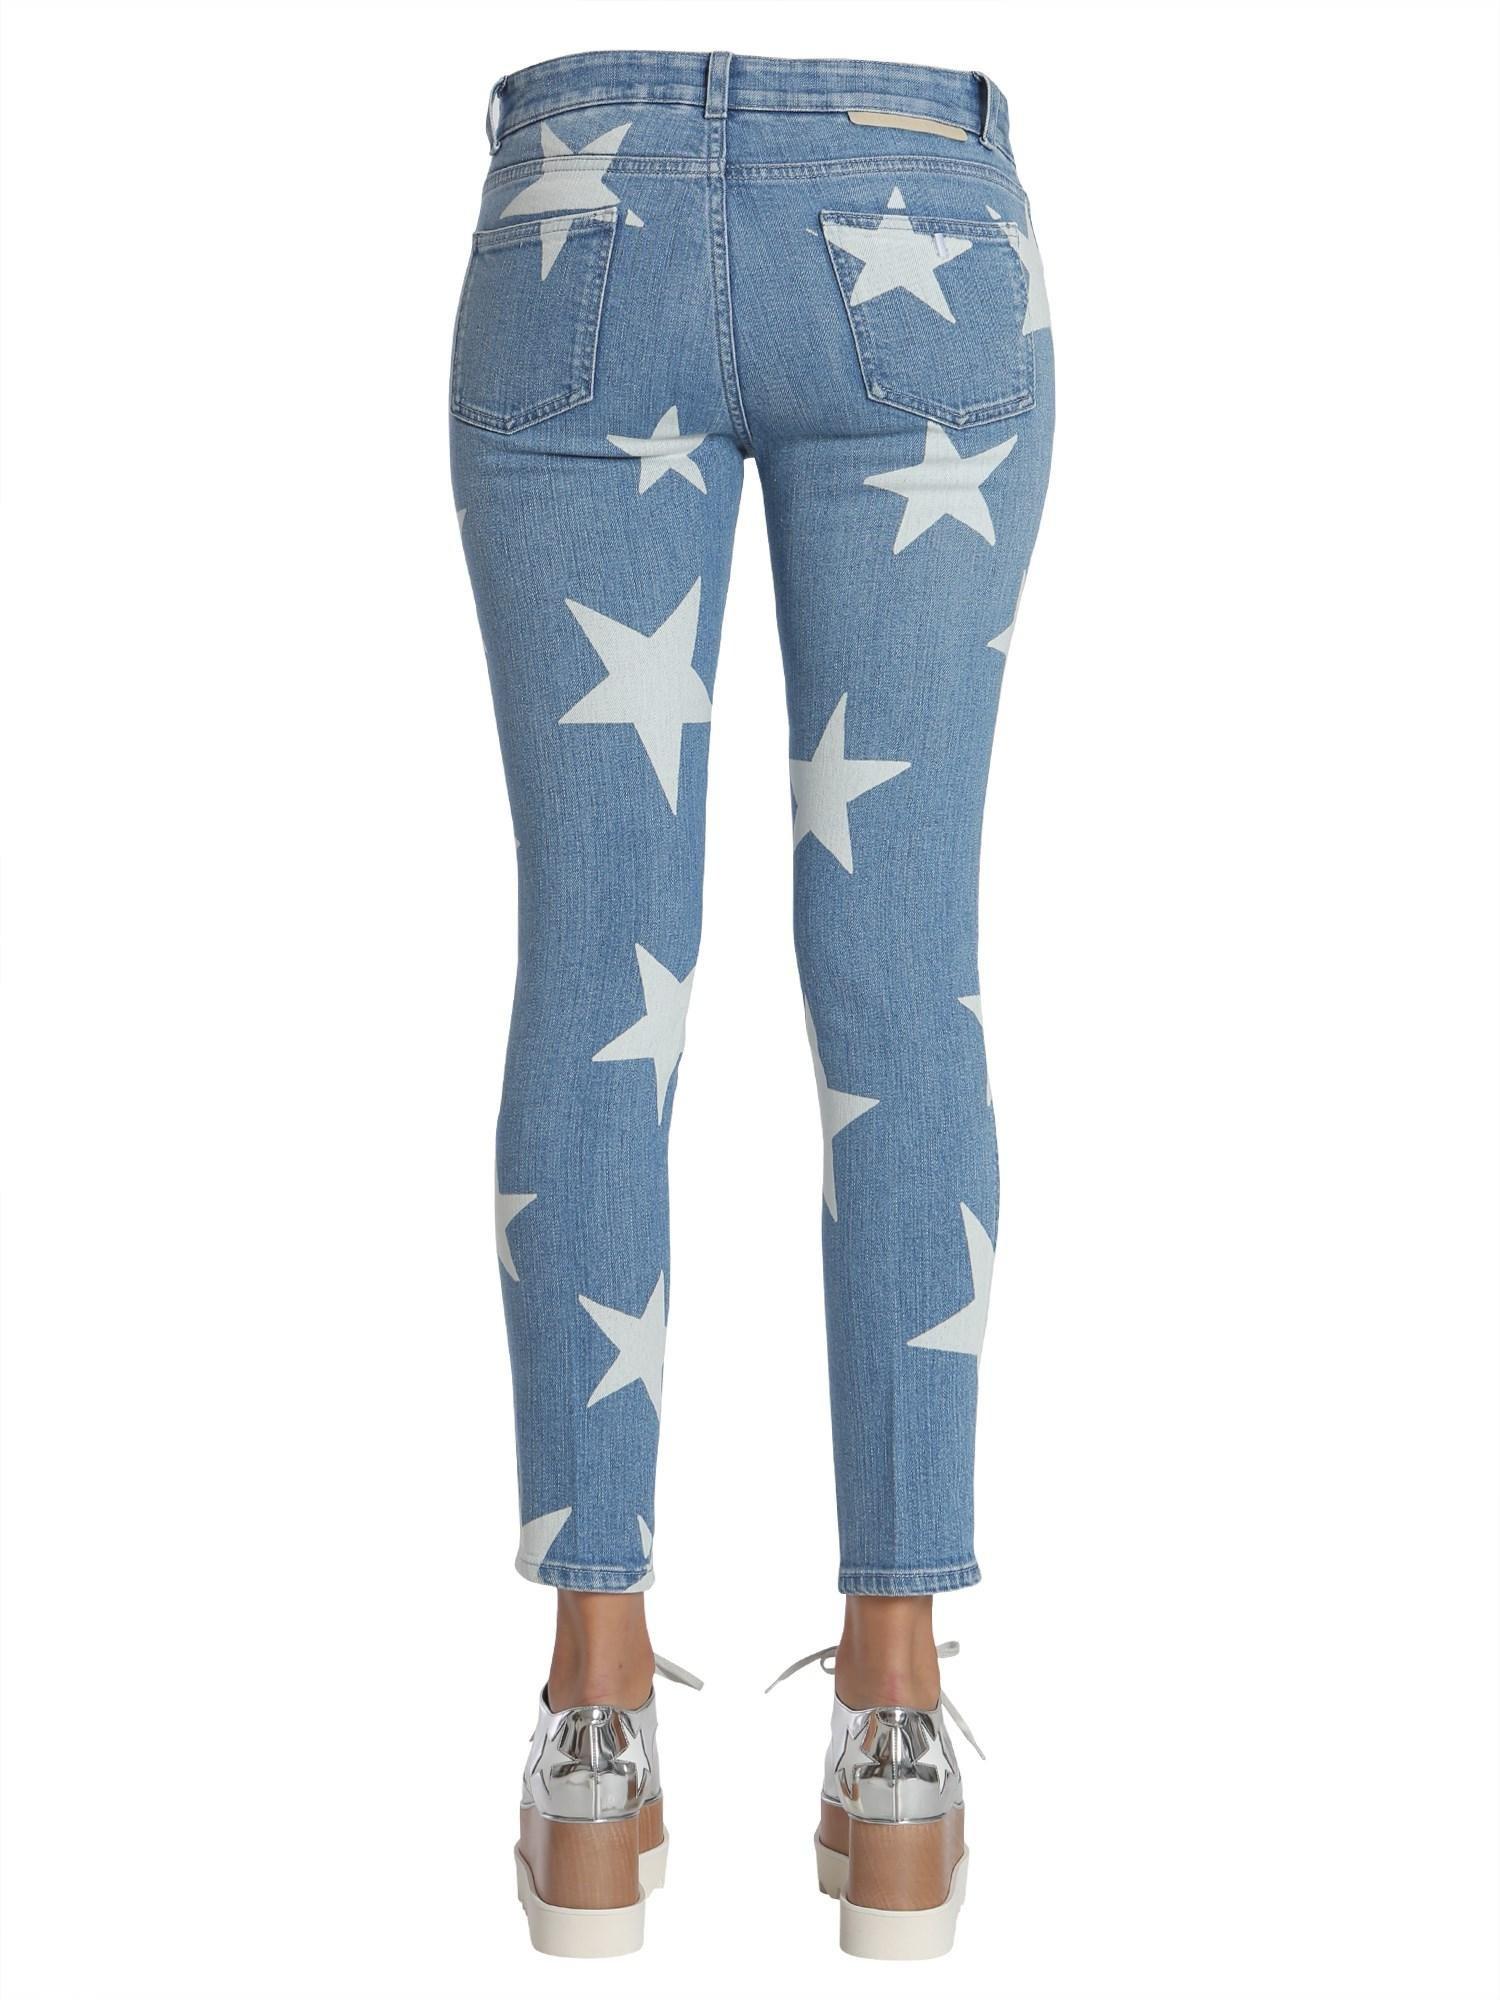 Stella McCartney Denim Ankle Grazer Star Jeans in Denim (Blue)